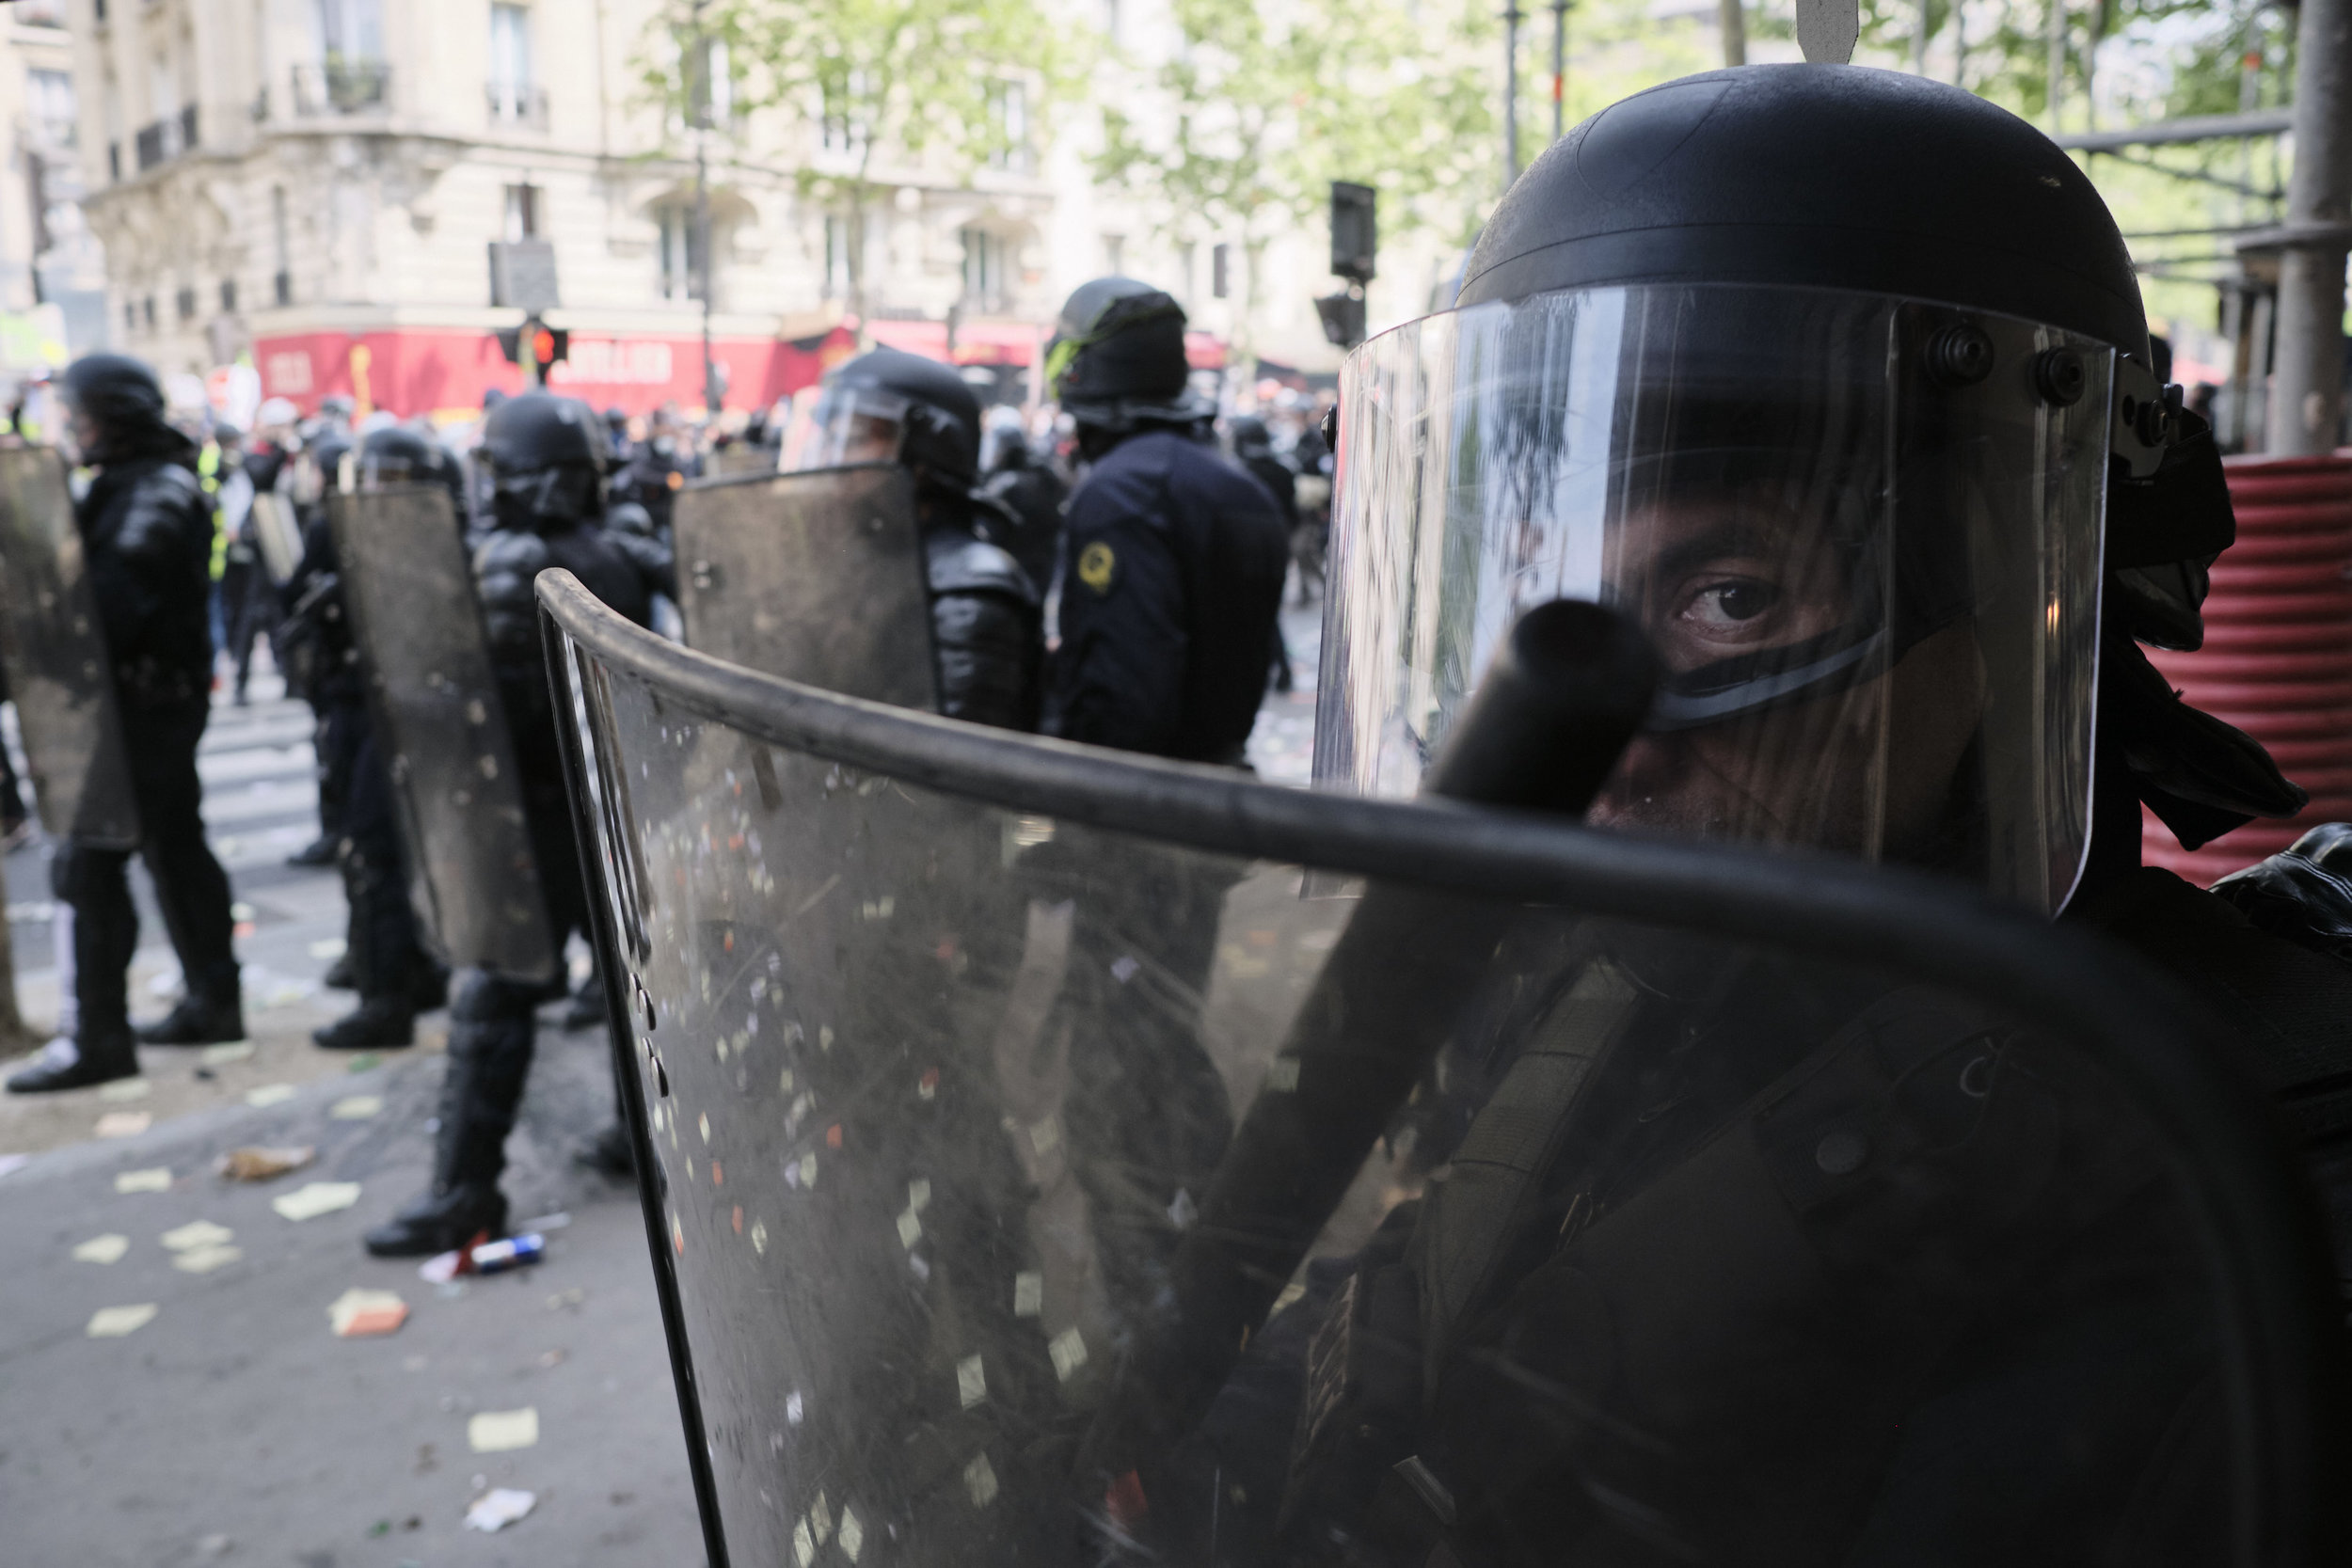 Riot police officer on edge after a violent confrontation with the protesters atBoulevard du Montparnasse.